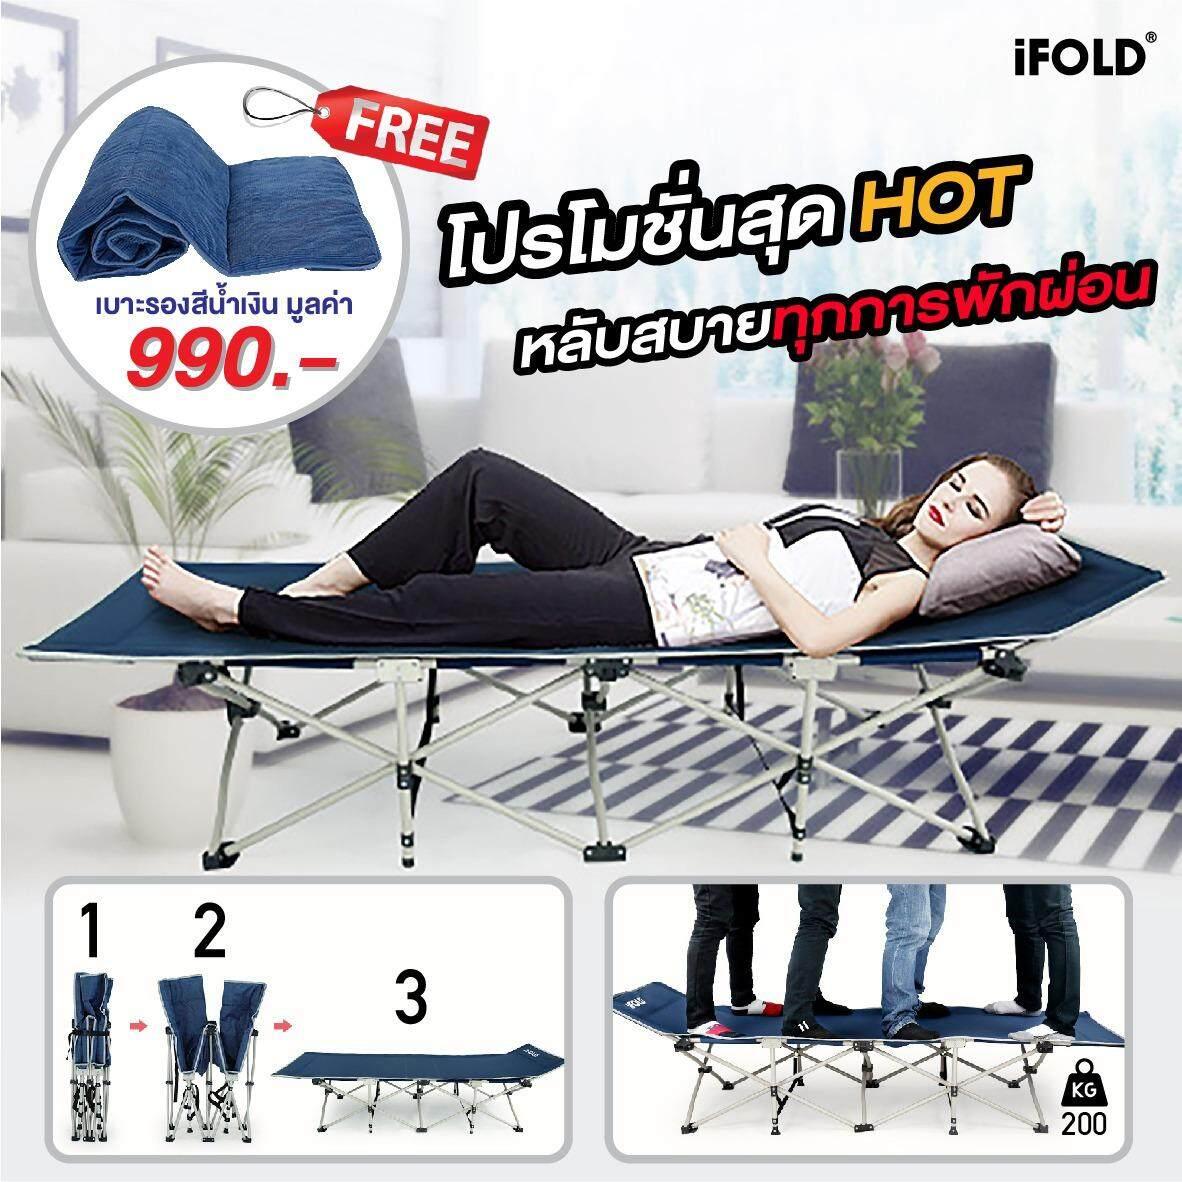 Sivili Ifold  เตียงสนามแบบพับได้ Eco Move  (ฟรี เบาะรองนอน)  Tr0332.